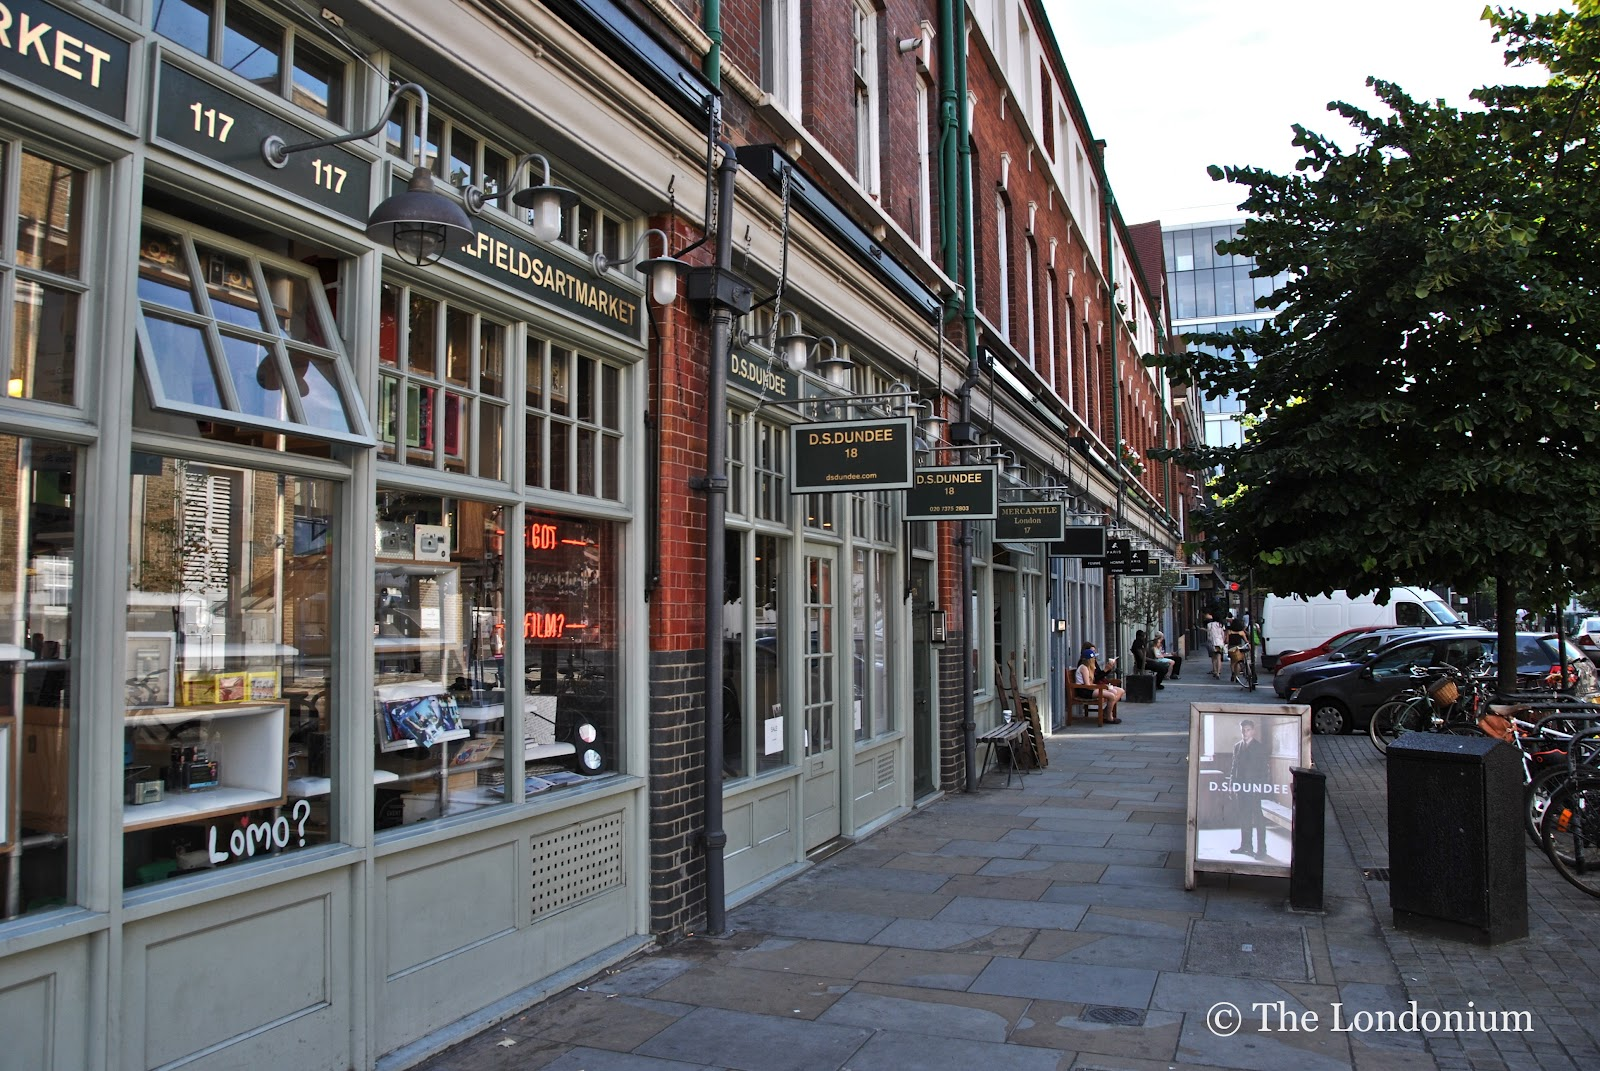 O faire du shopping londres the londoniumthe londonium - Shopping pas cher londres ...